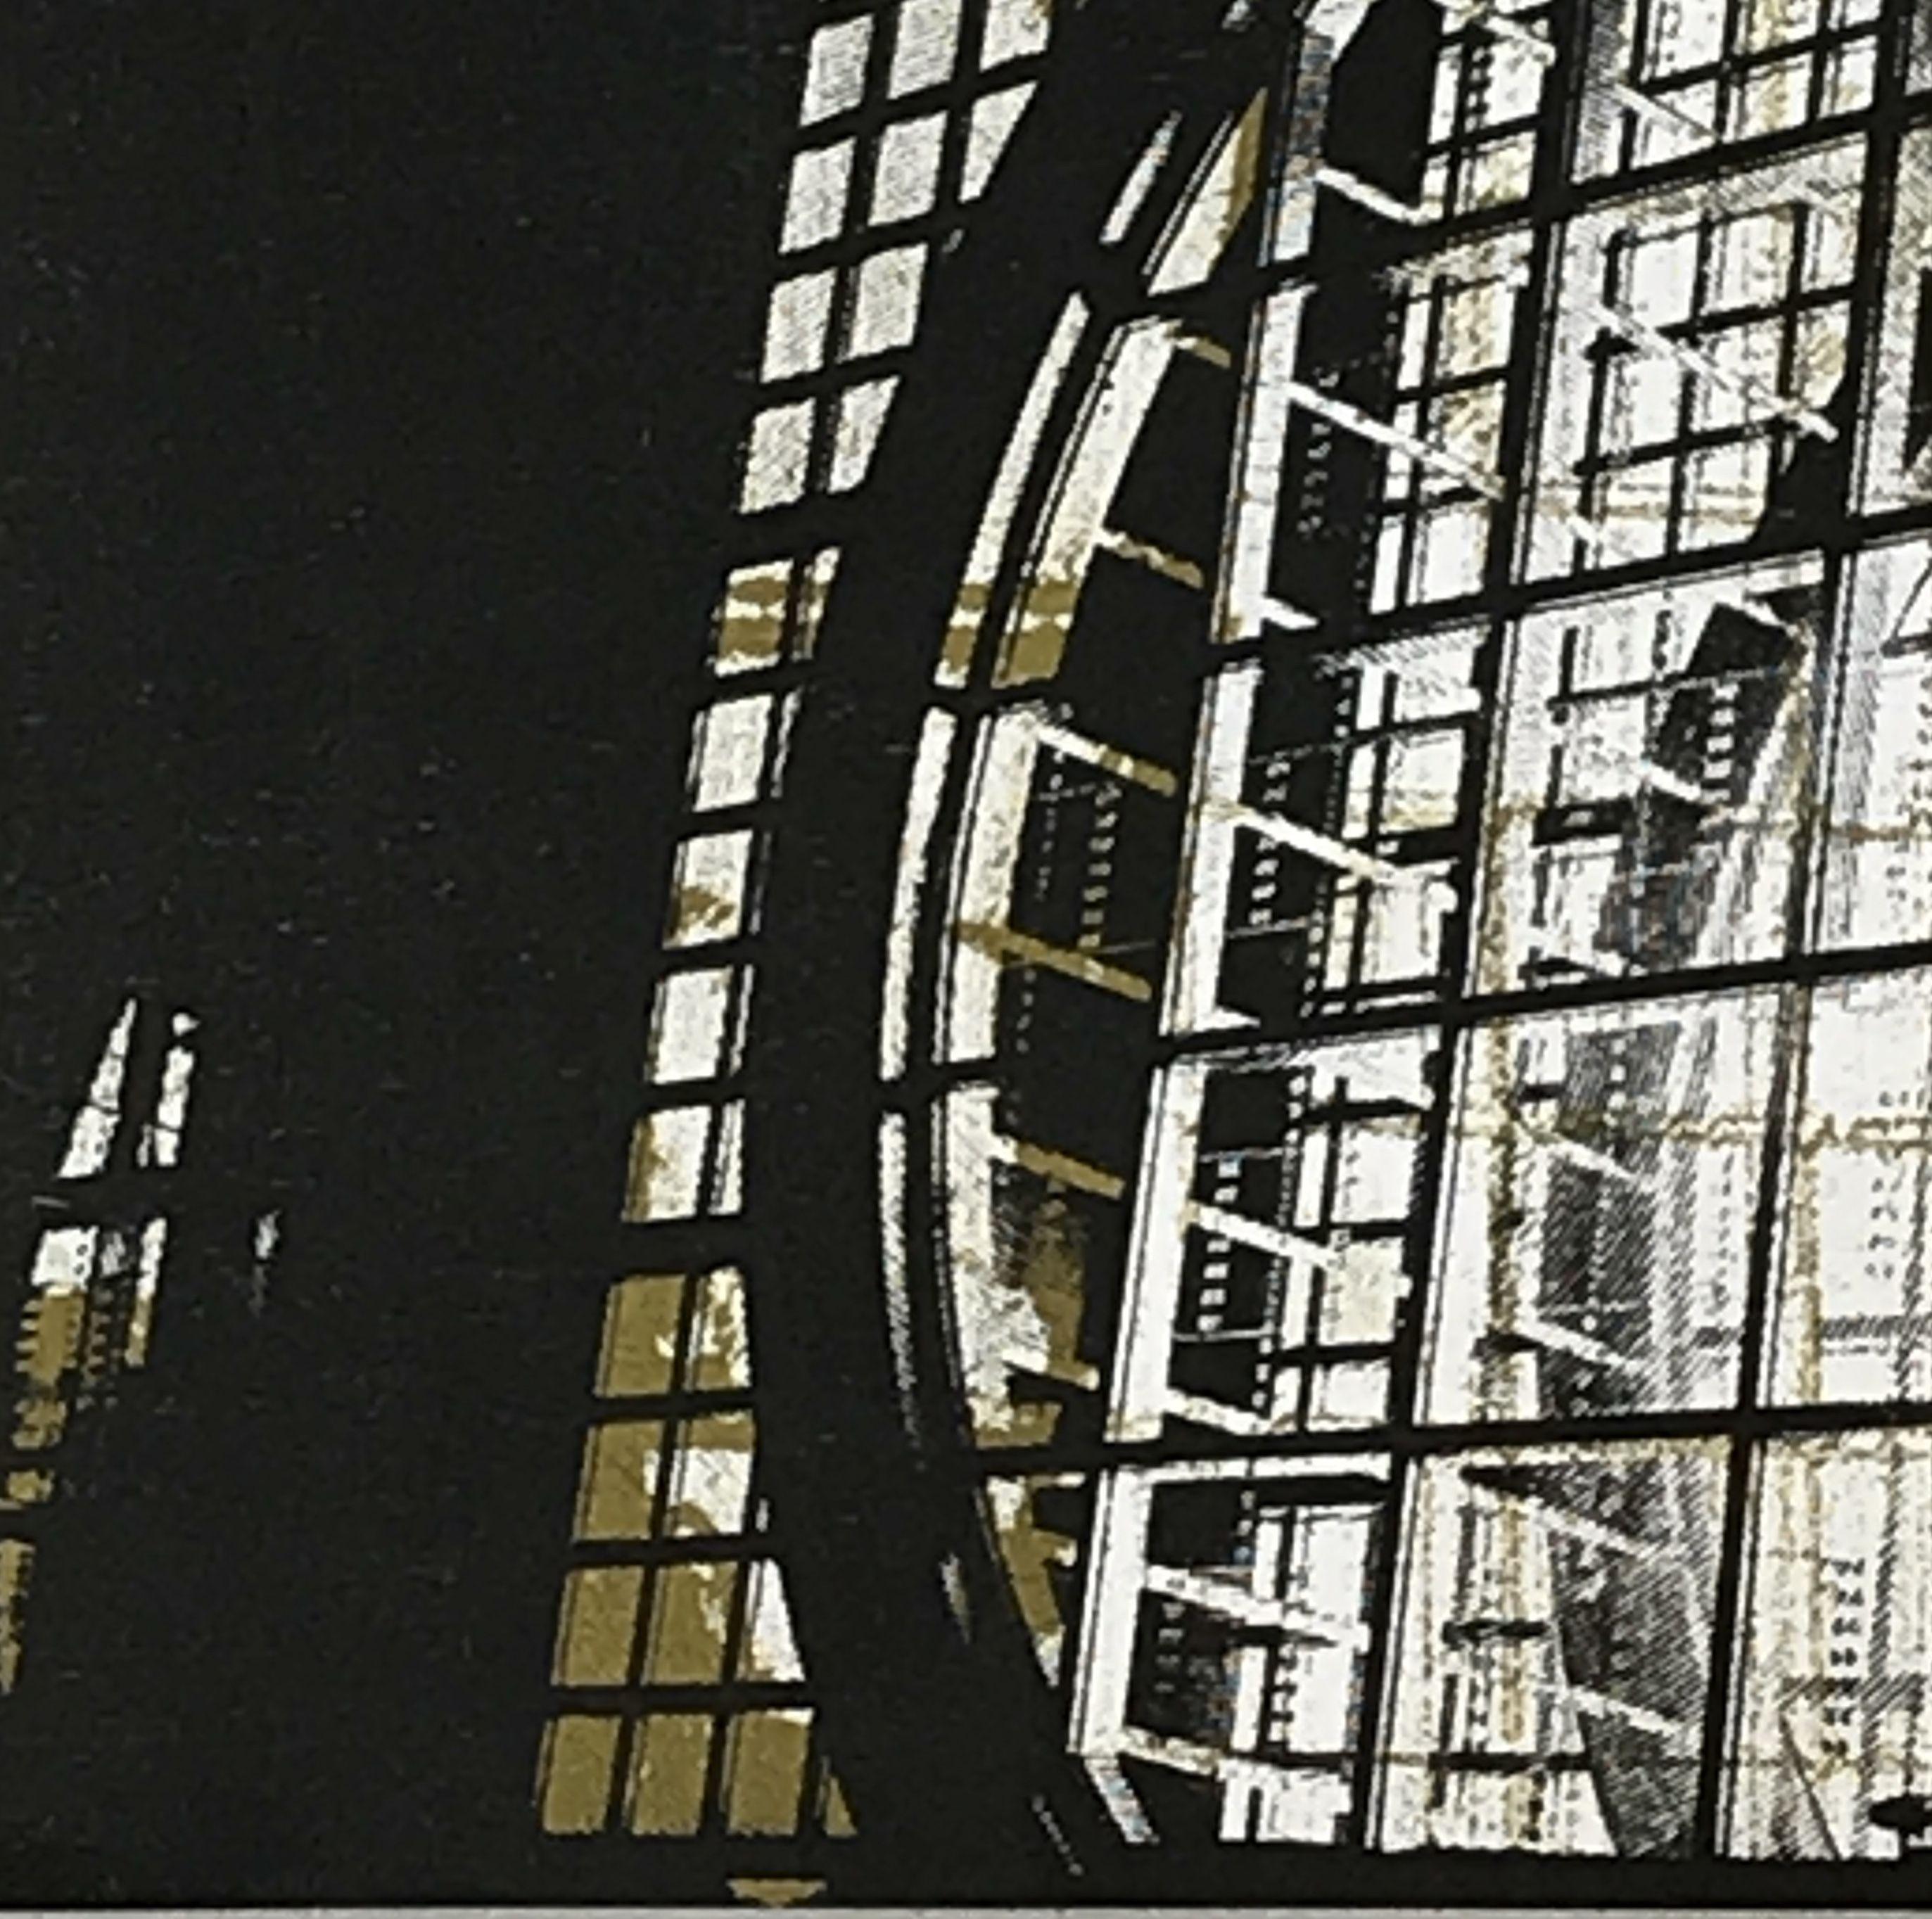 Best Pin By Merrill Shatzman On Architectural Grid Patterns 400 x 300